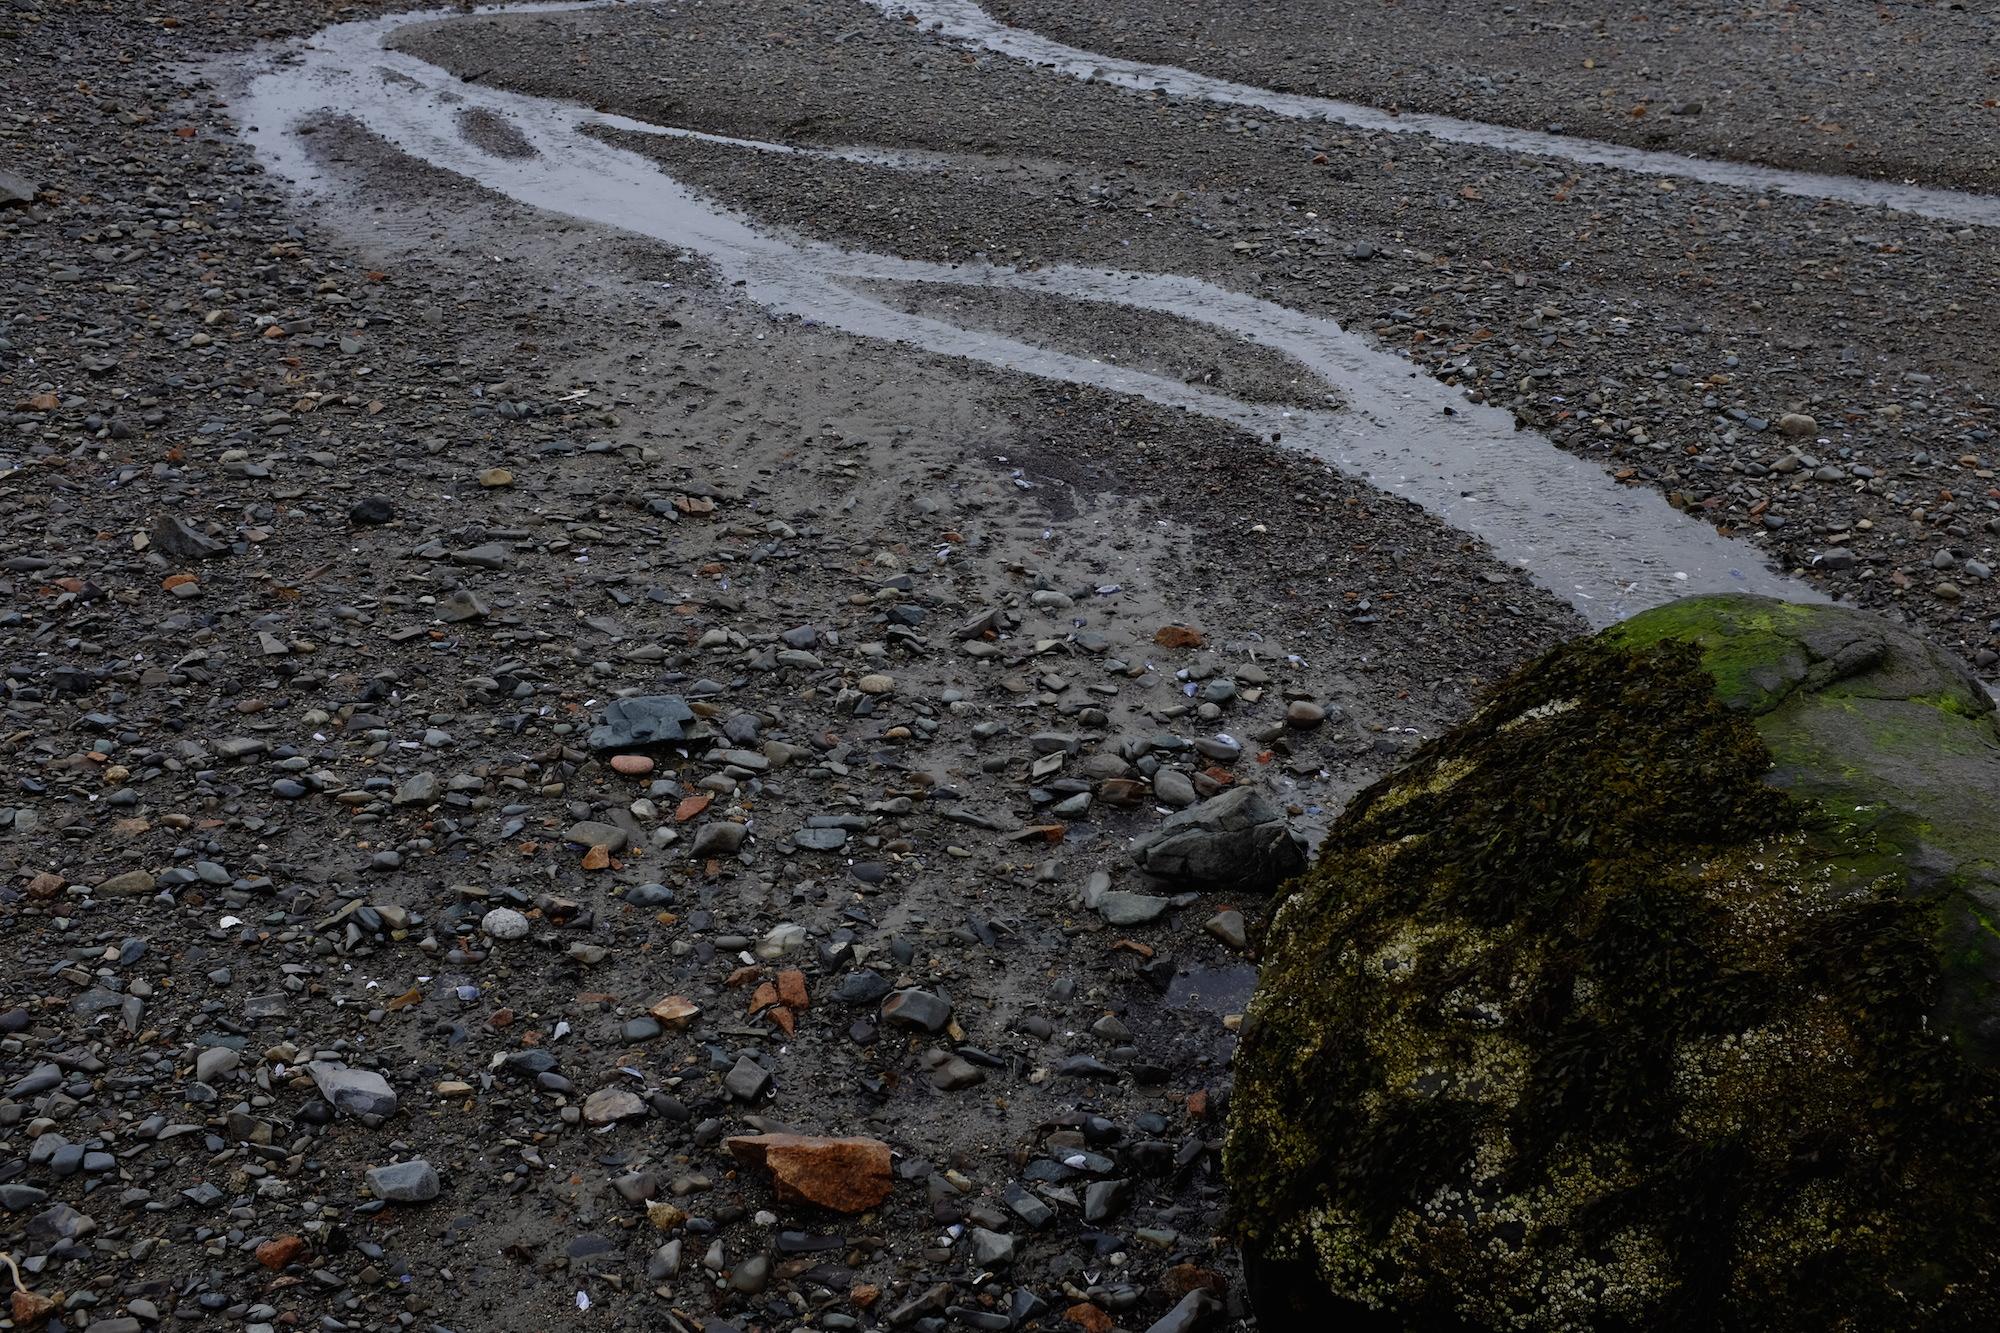 Hulls Cove Beach, Composition 2